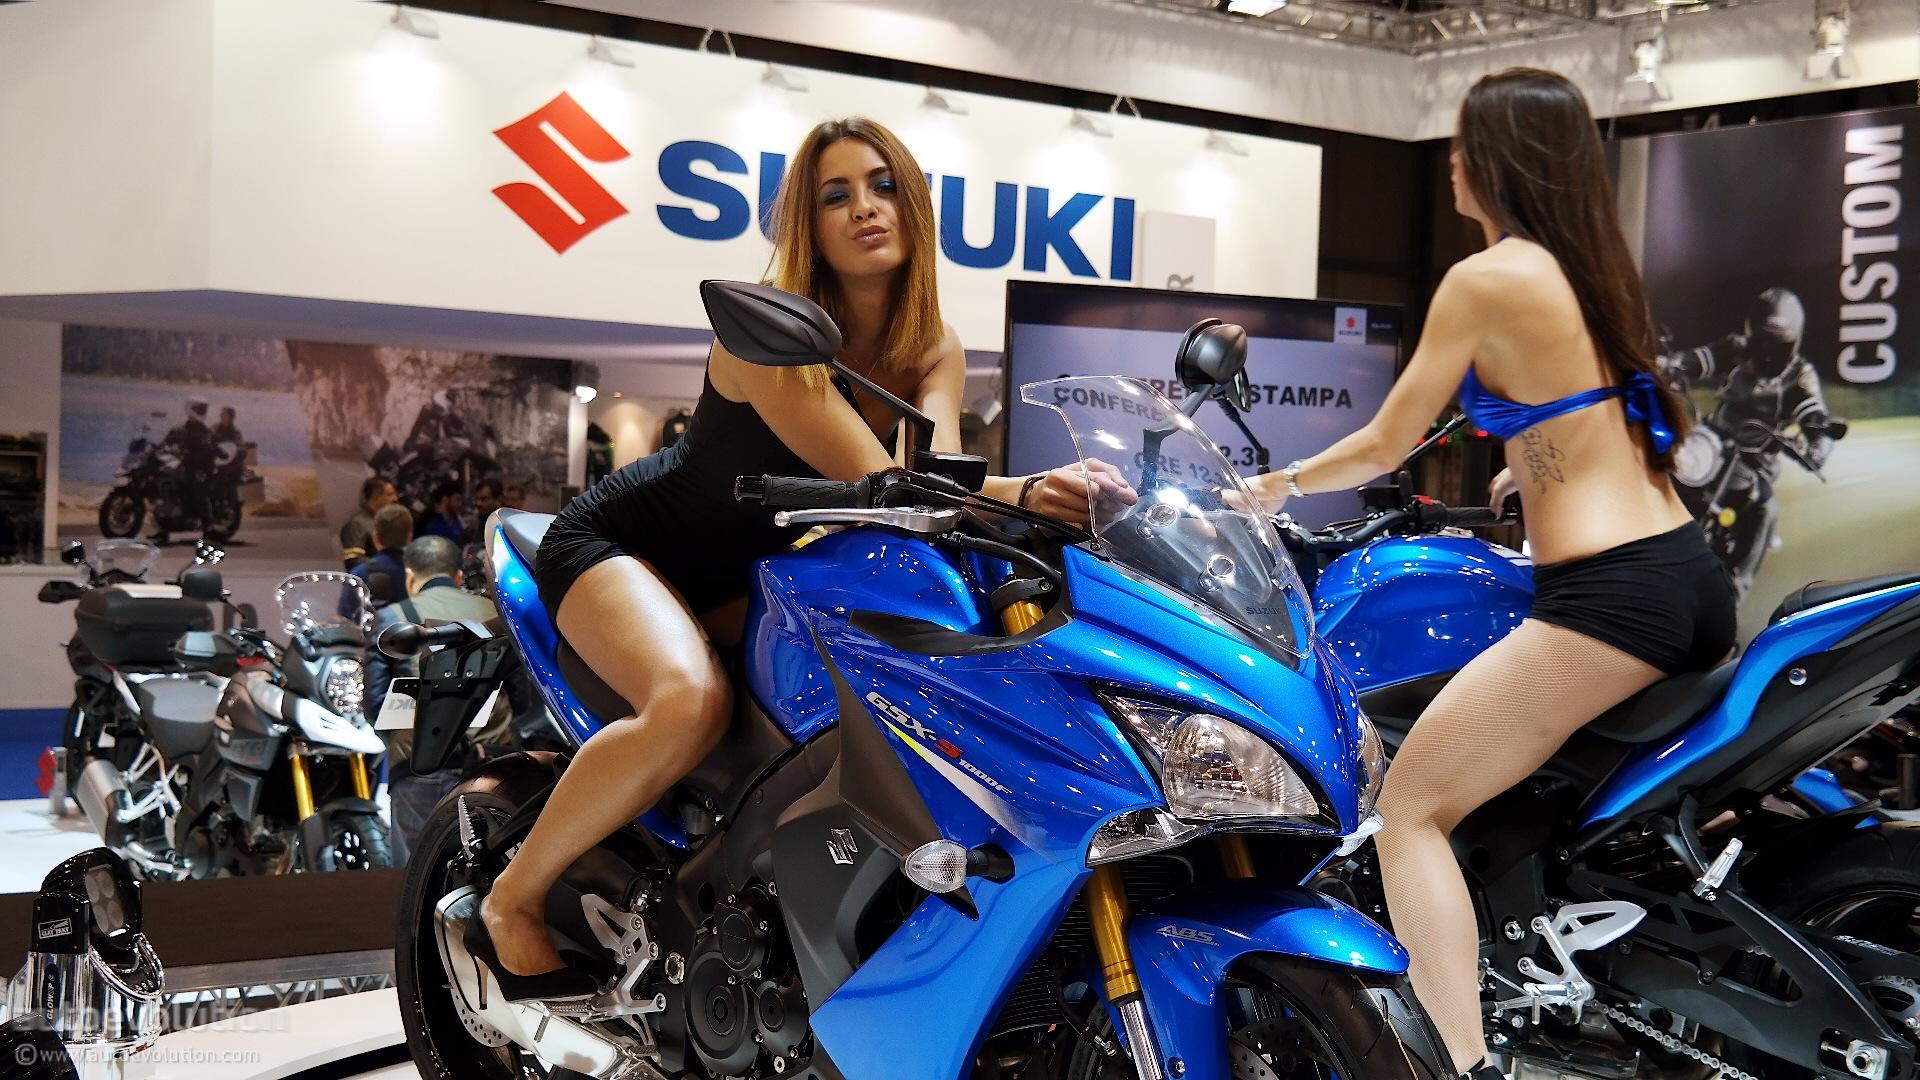 2016 Suzuki GSX-S1000F ABS Debuts at EICMA 2014 [Live Photos] - autoevolution